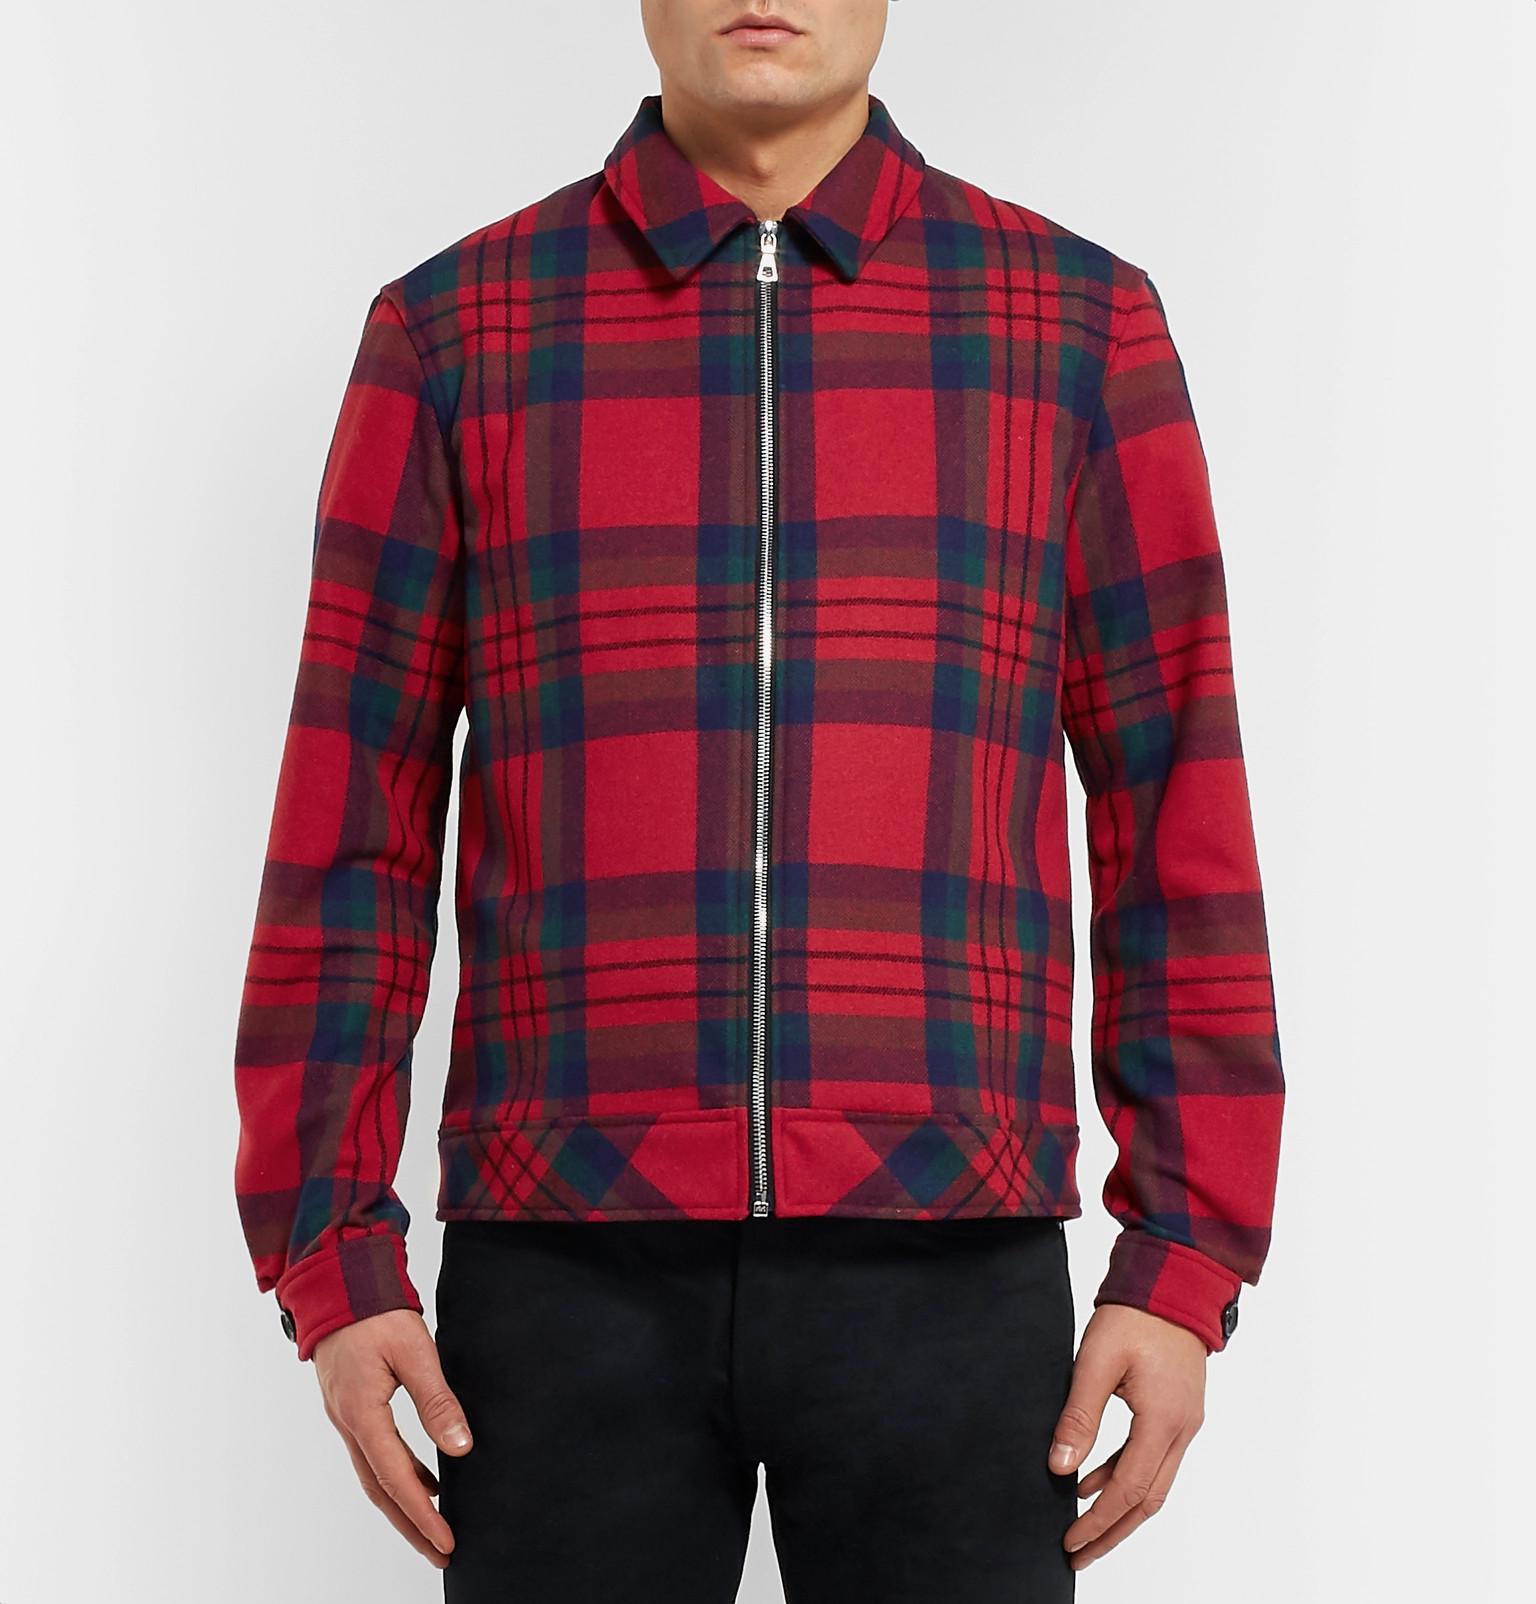 Blouson Blend Jacket John Wool Elliottchecked qfHUnBTt